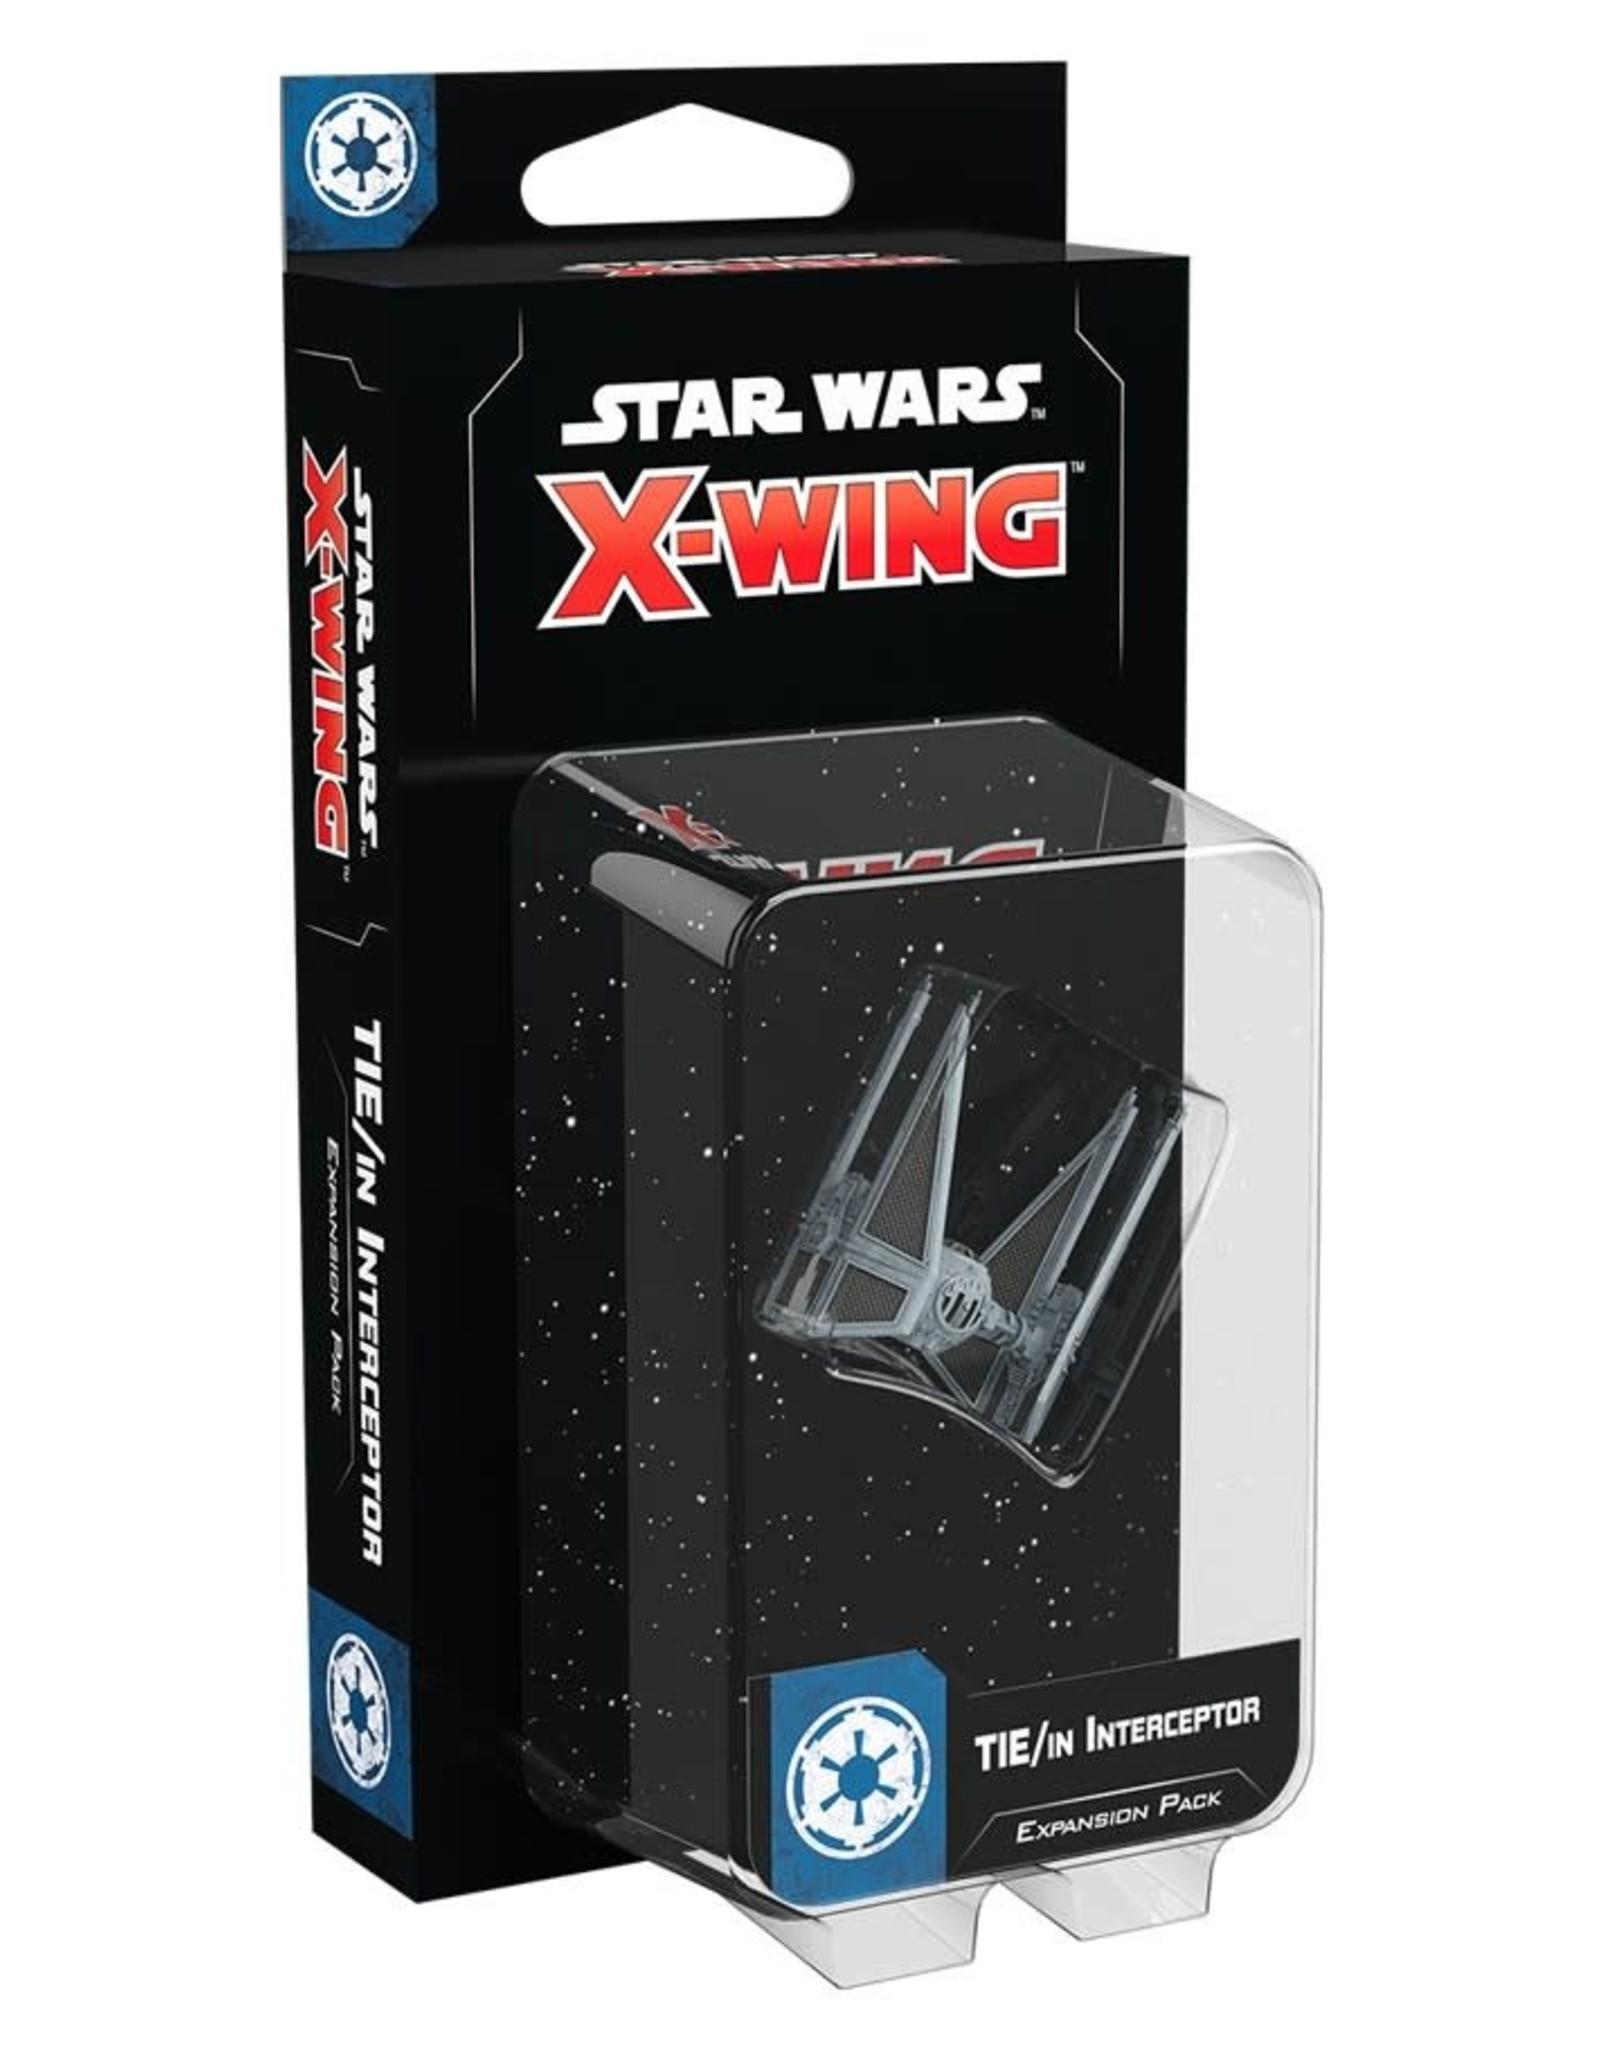 Fantasy Flight Games Star Wars X-Wing TIE/In nterceptor